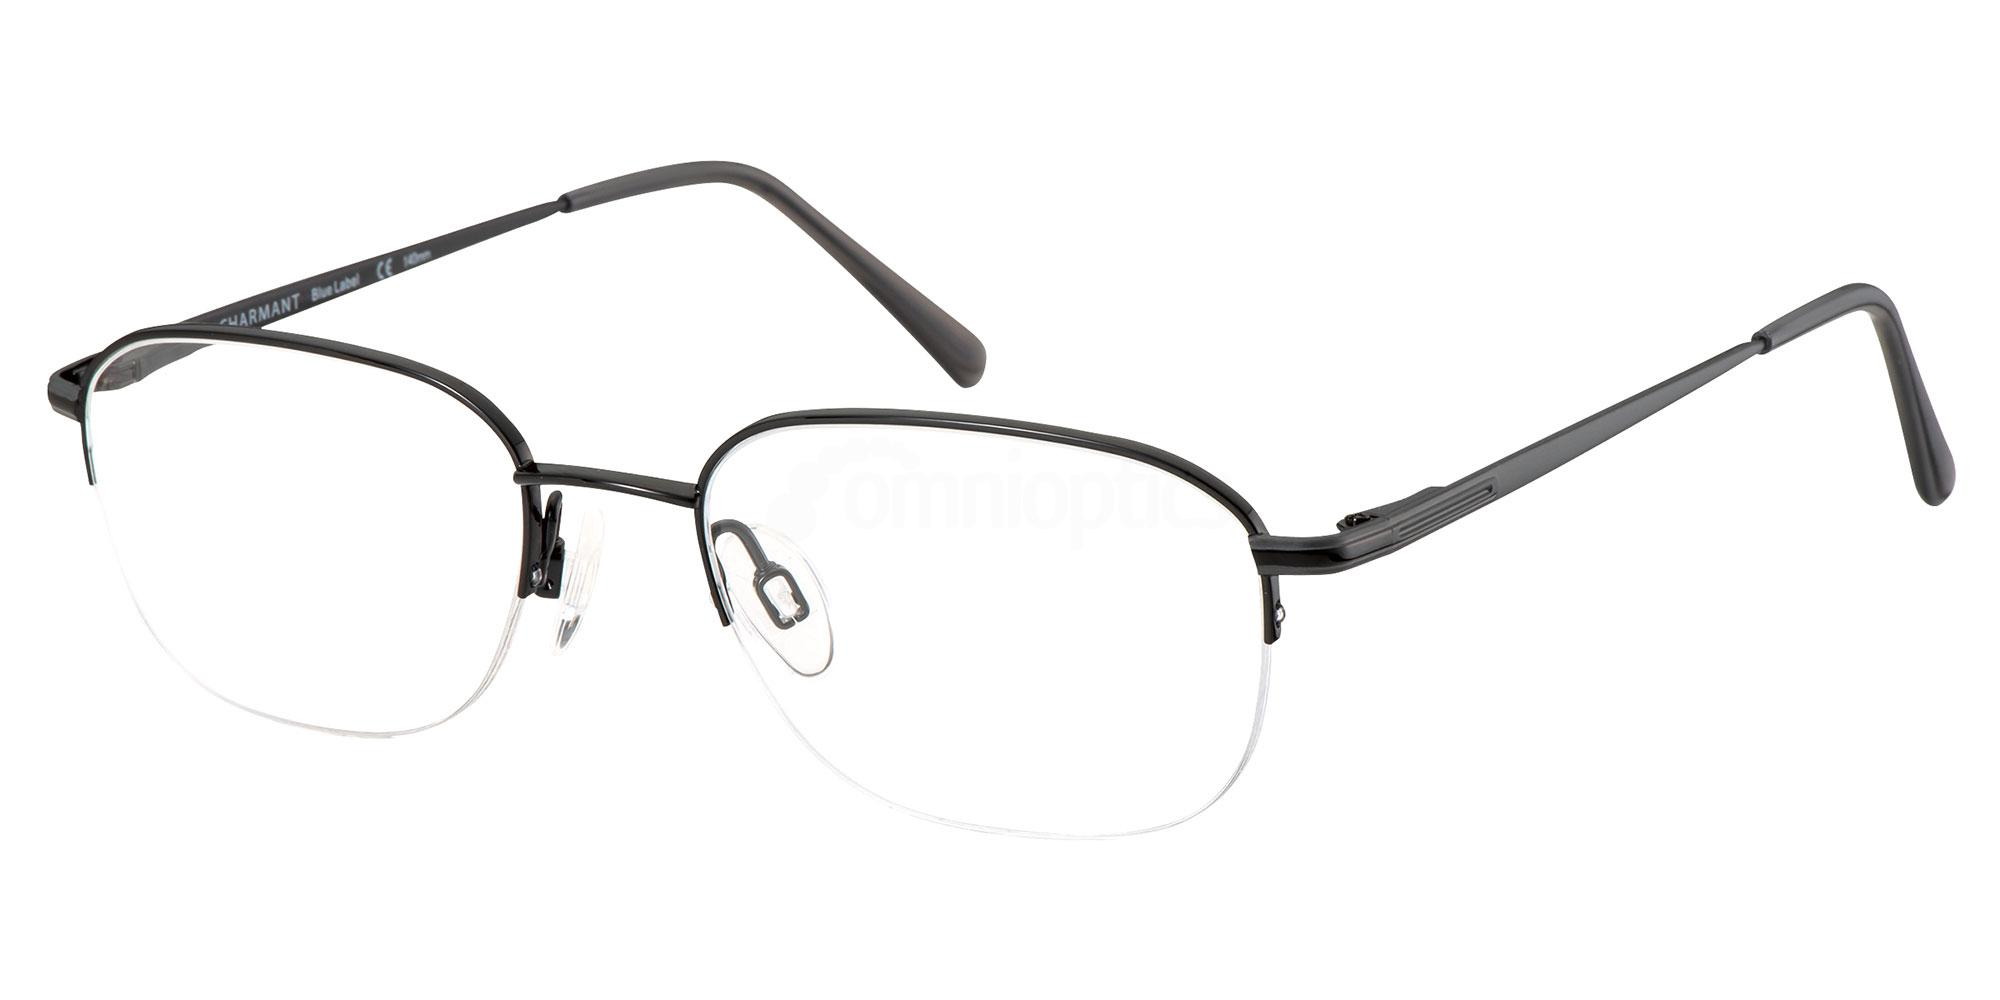 BK CH16125 Glasses, Charmant Blue Label